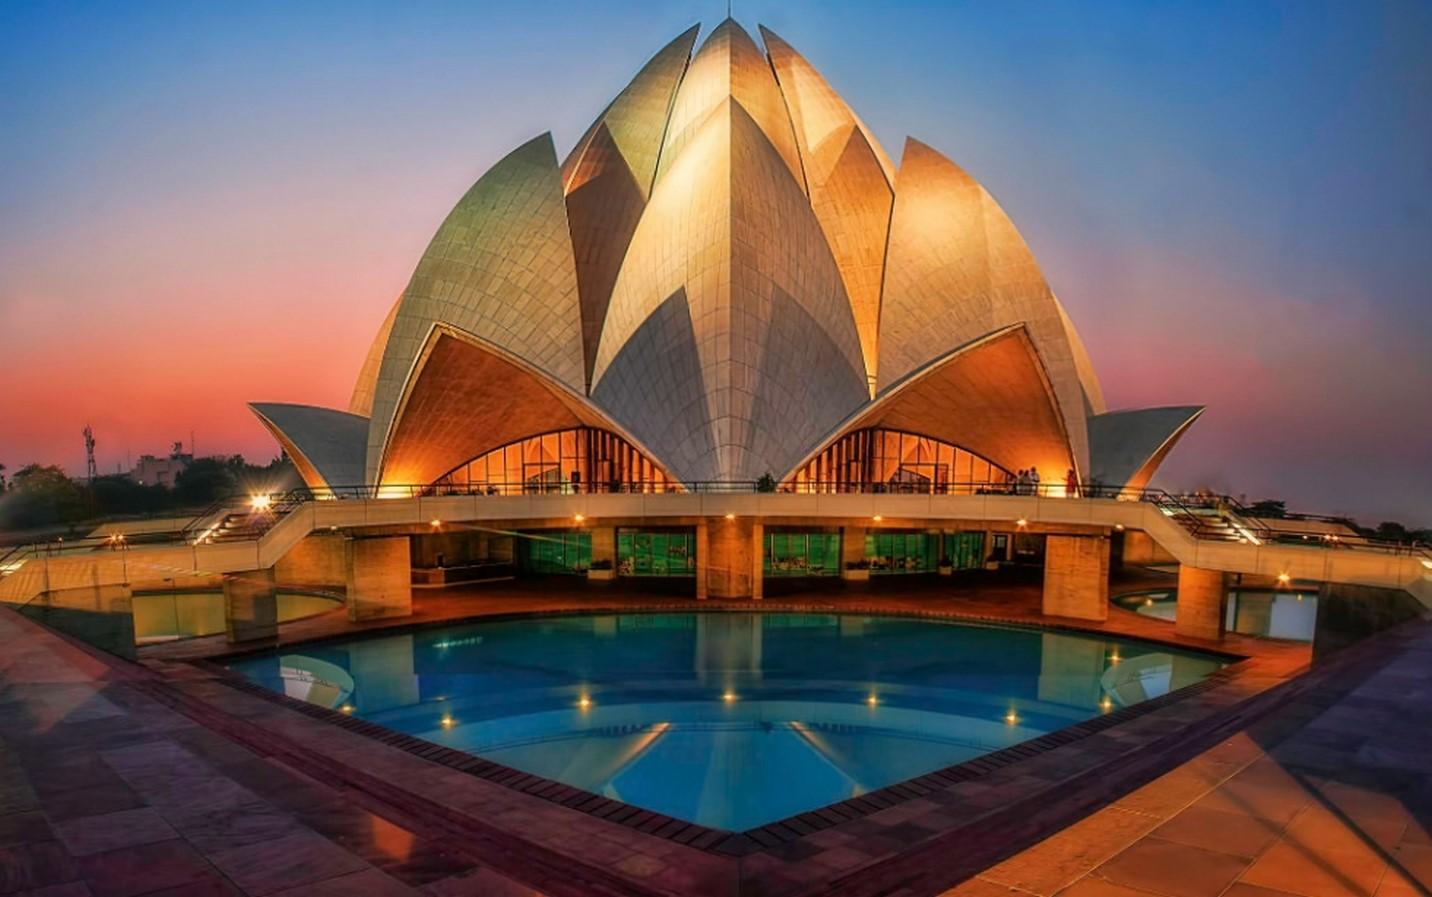 Lotus Temple in New Delhi, India. - Sheet1